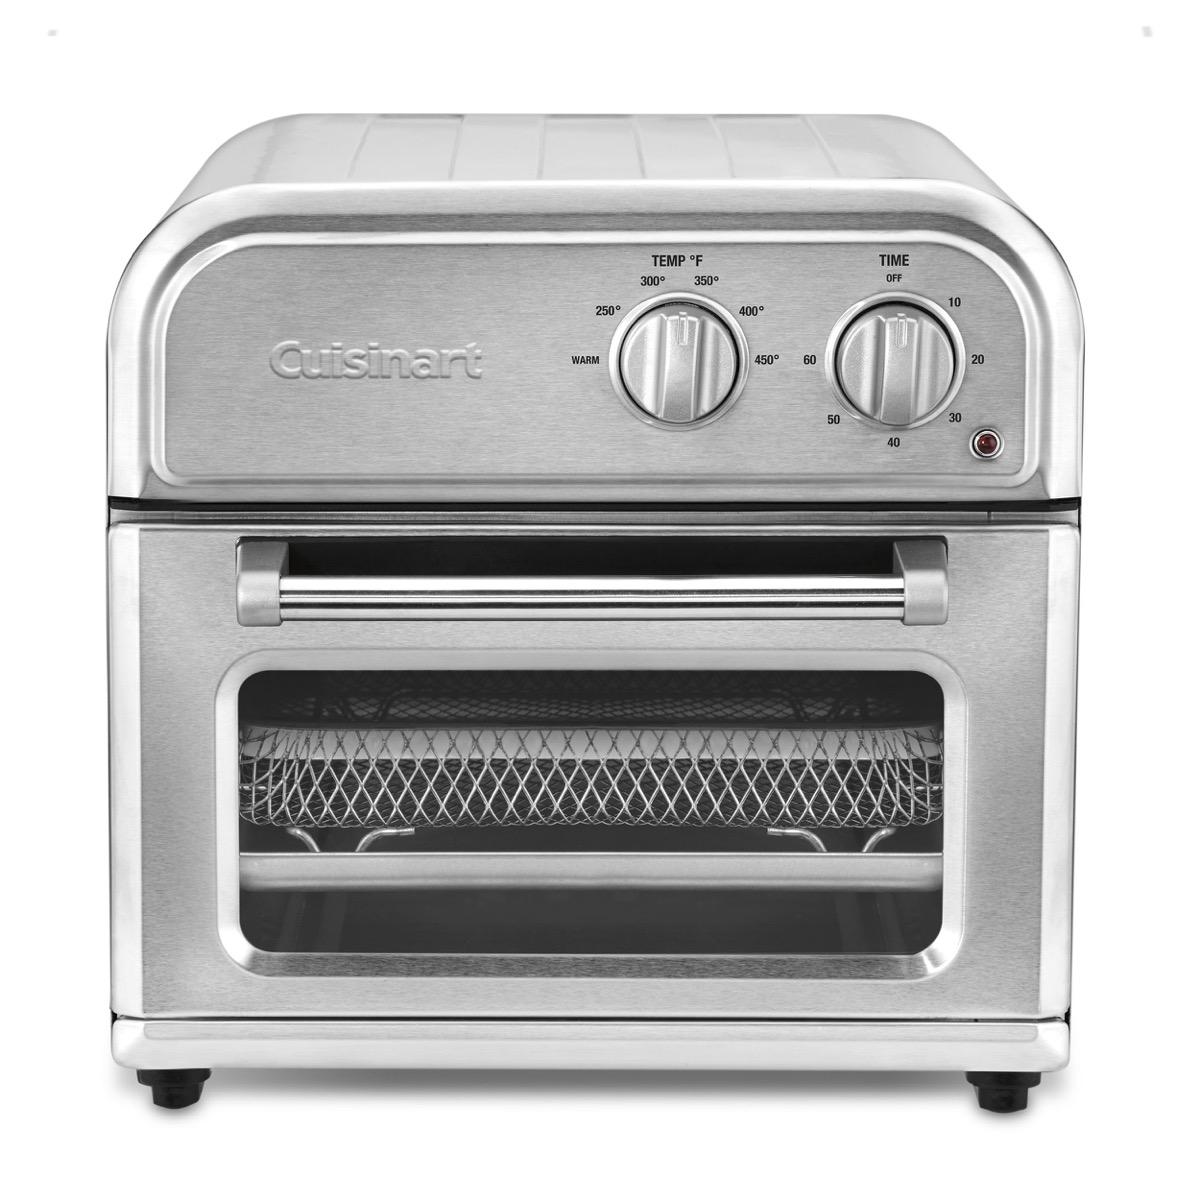 Stainless steel air fryer